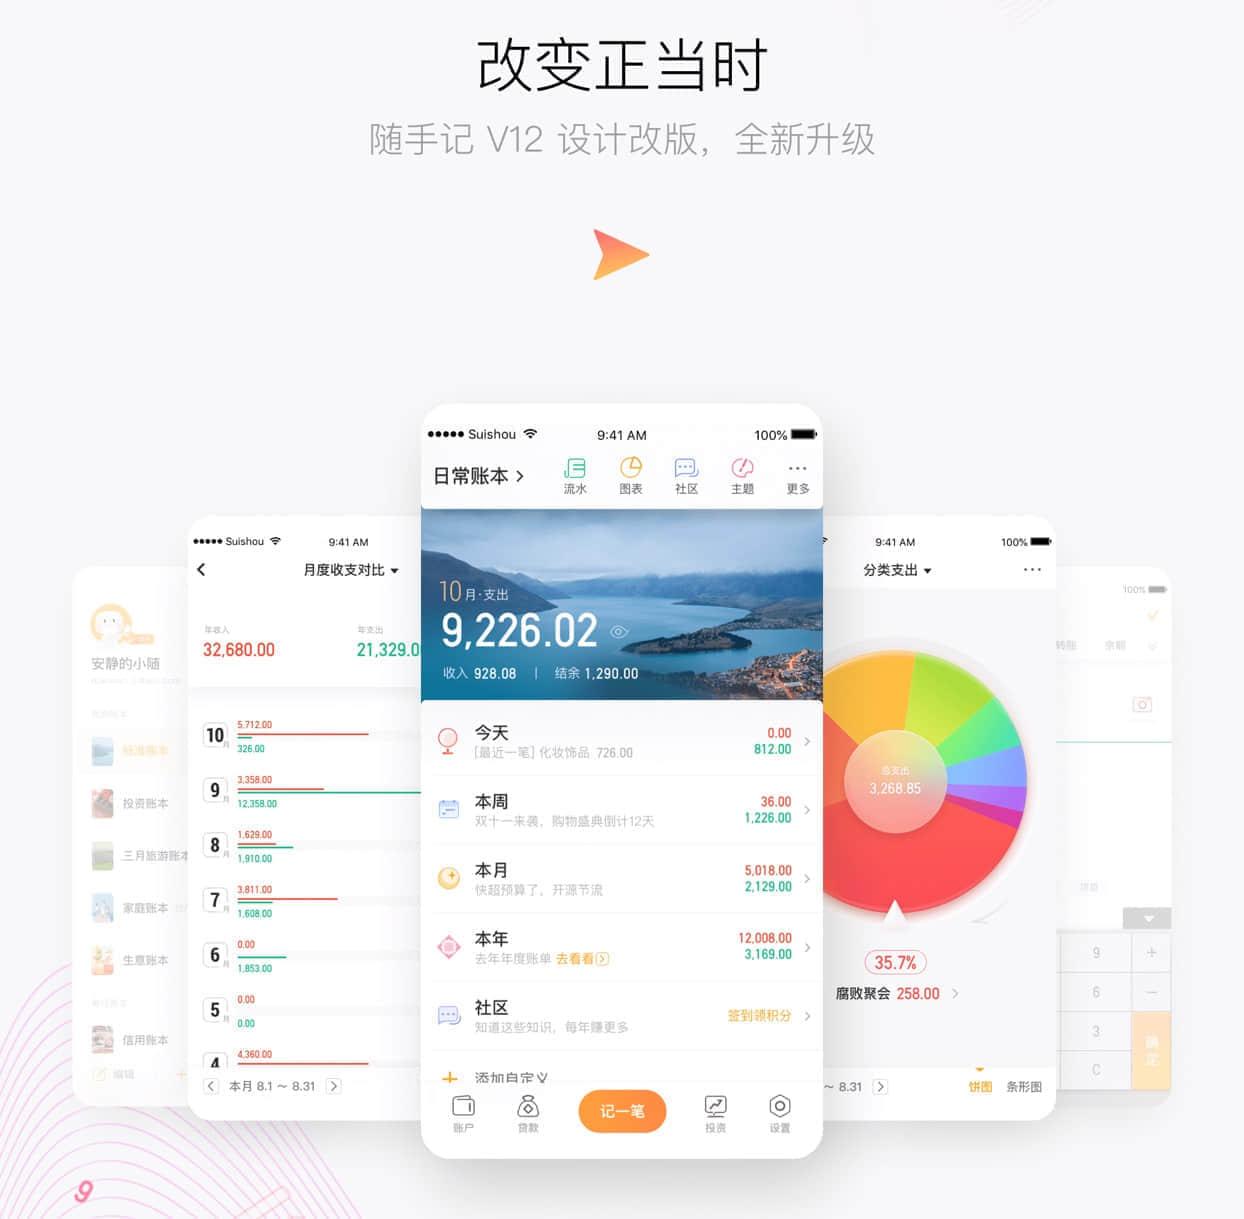 C:\Users\Admin\AppData\Local\Temp\WeChat Files\ed58b0a83685ee6144befdf8710b7ba.jpg